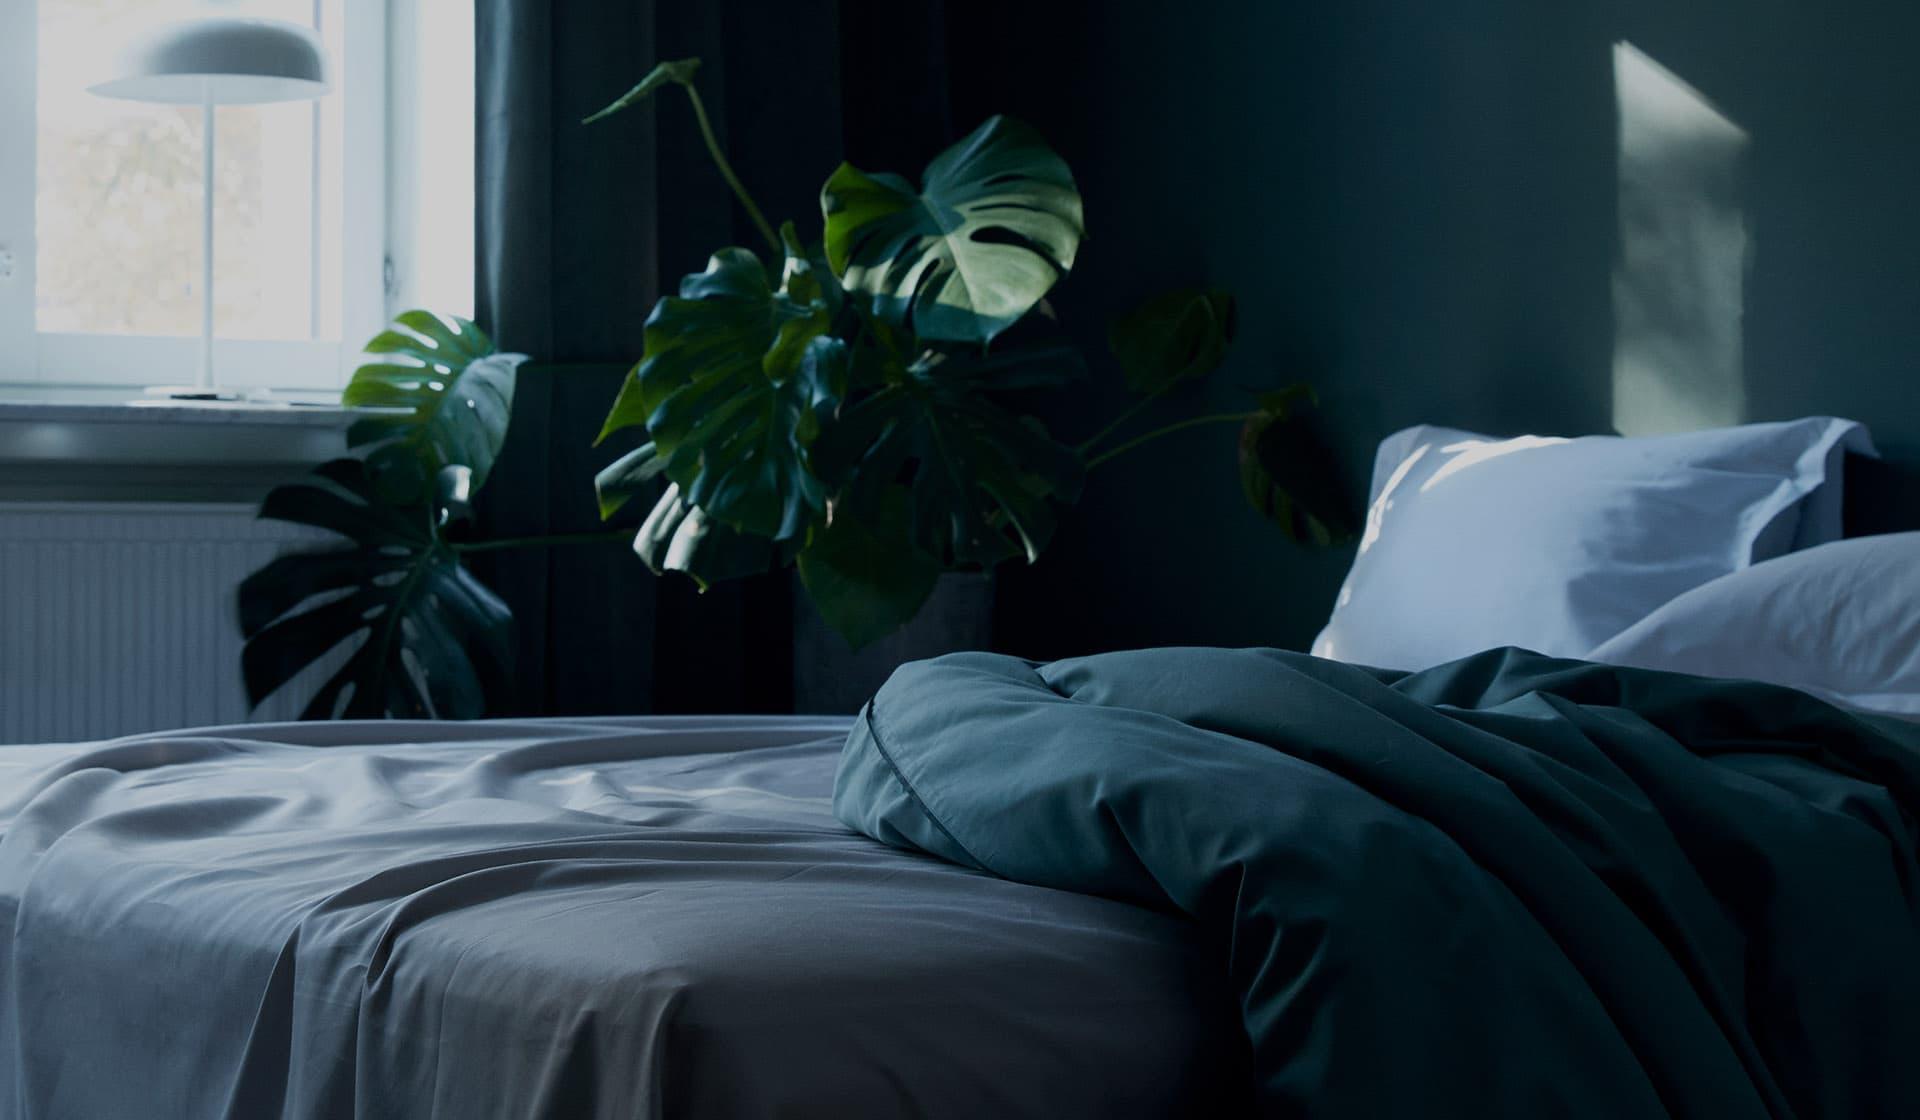 Bed sheets online from Alva